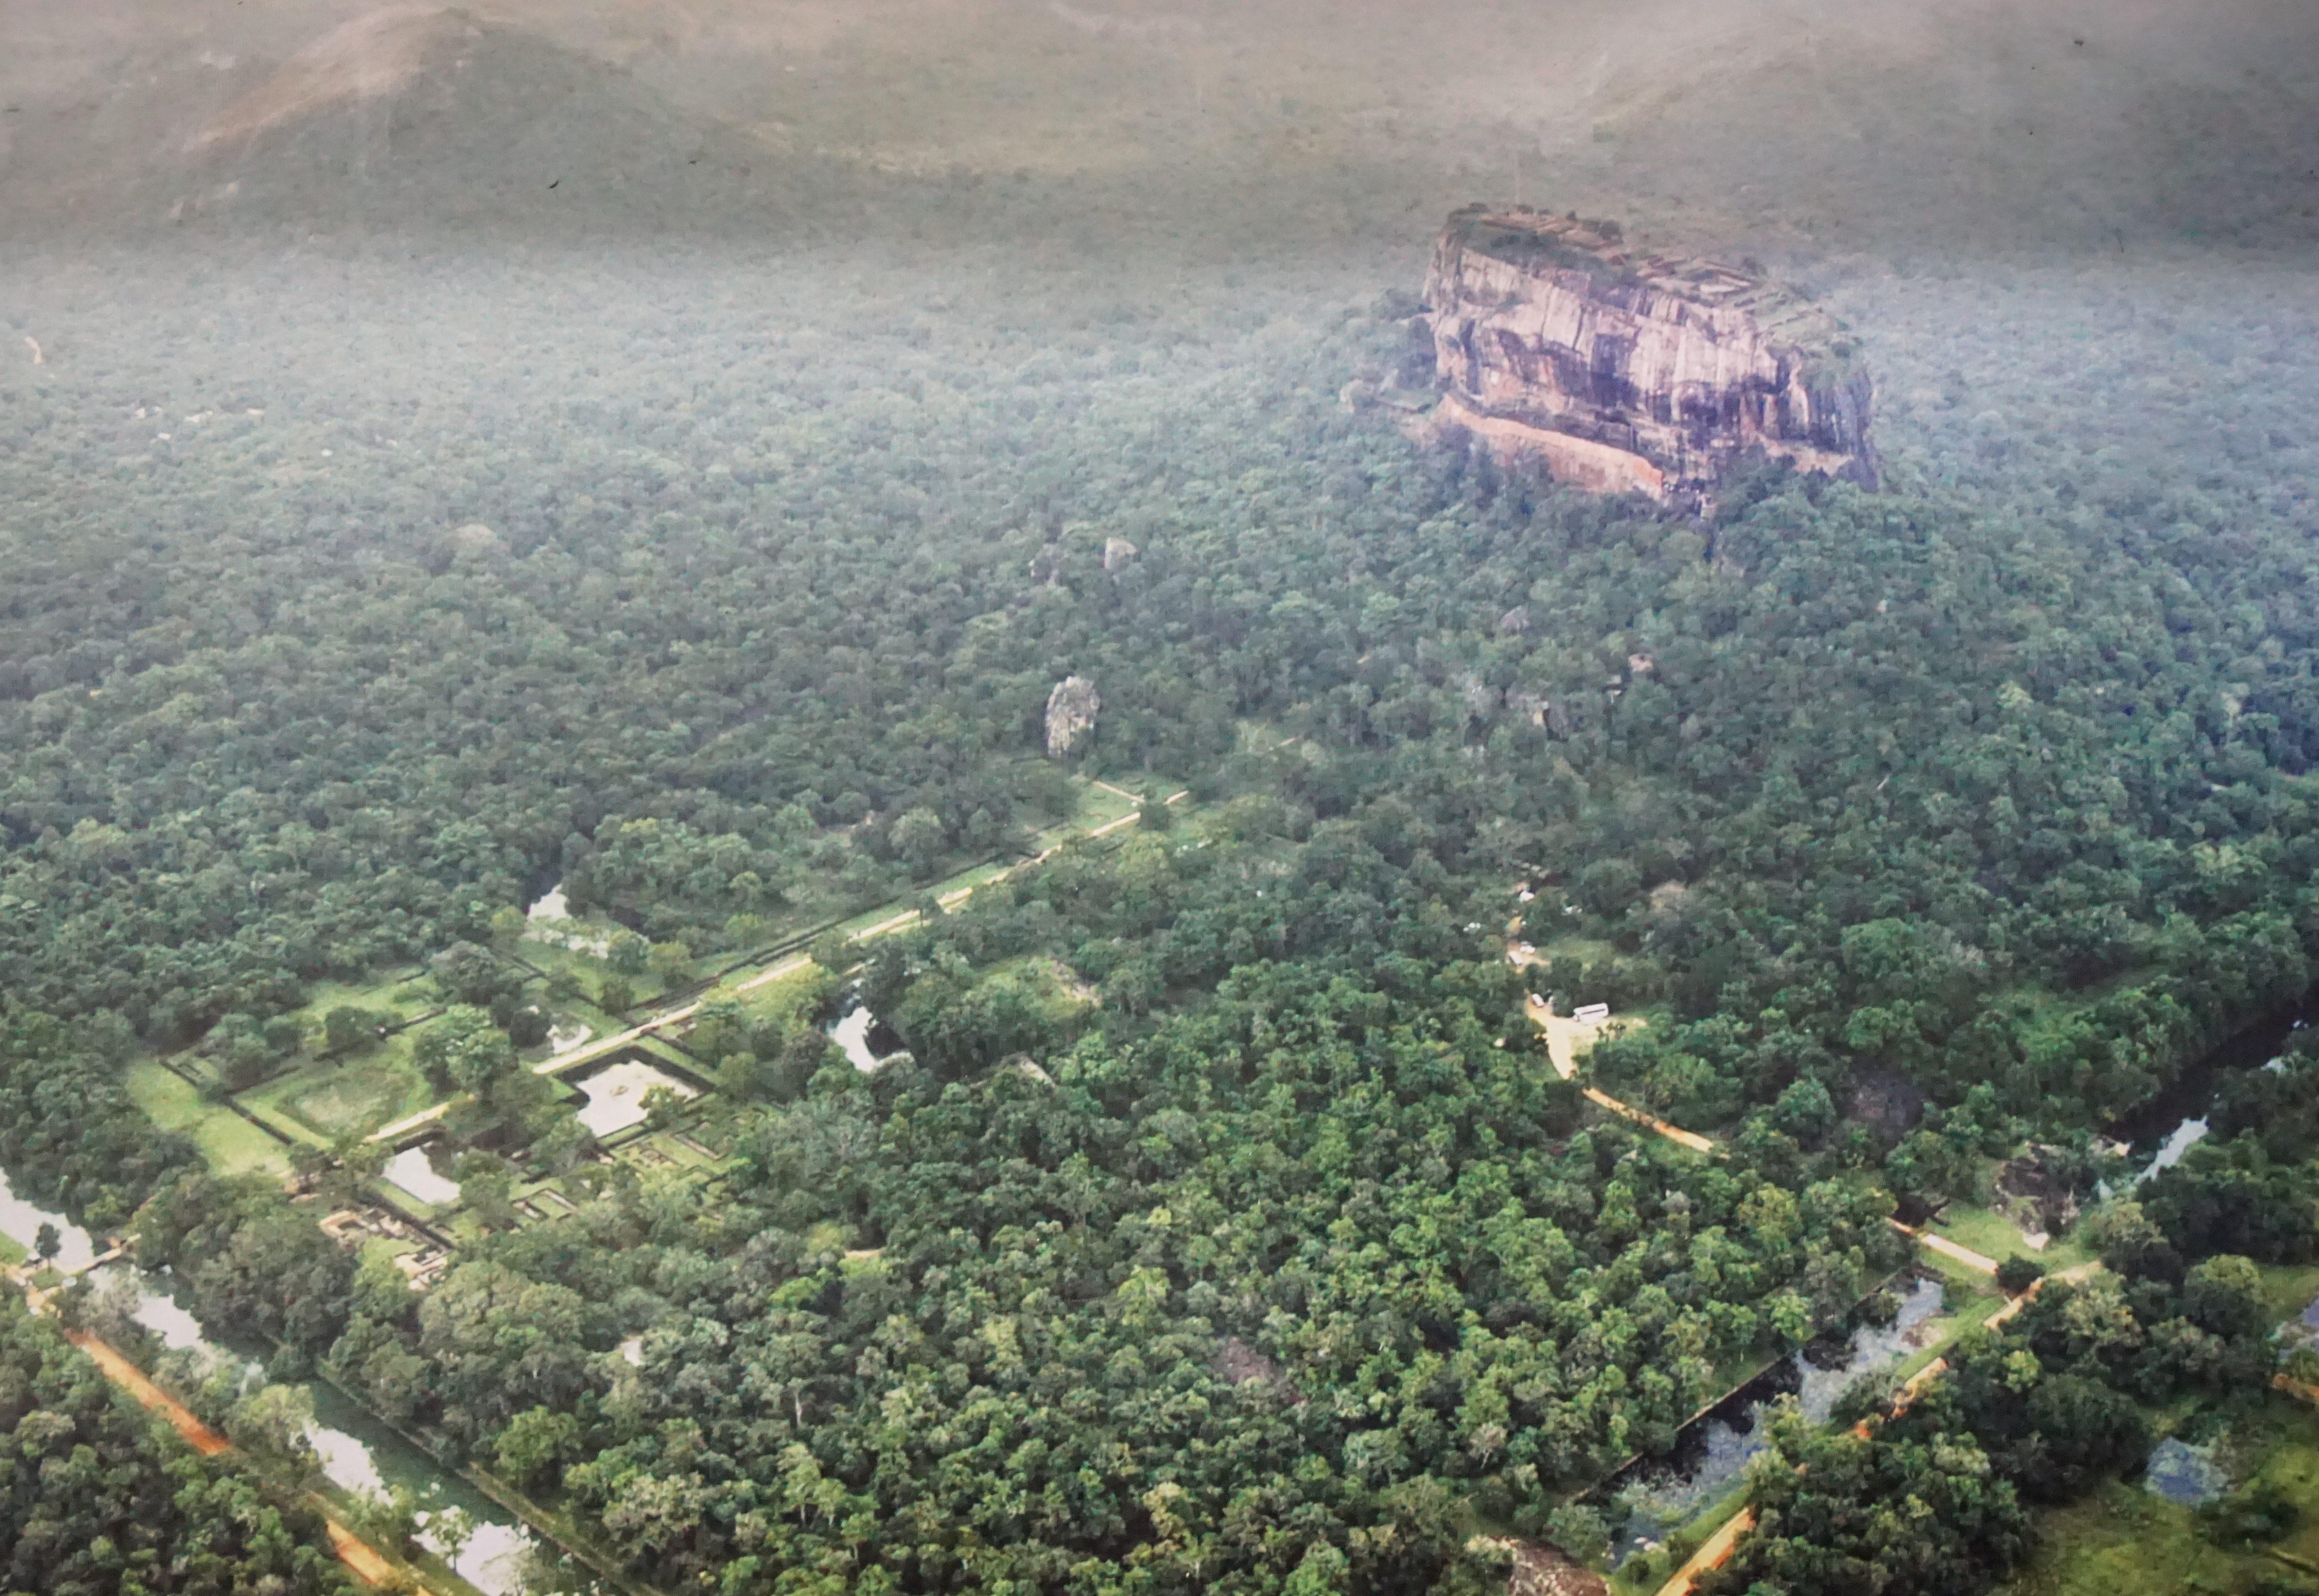 Aerial vieẃ of Sigiriya